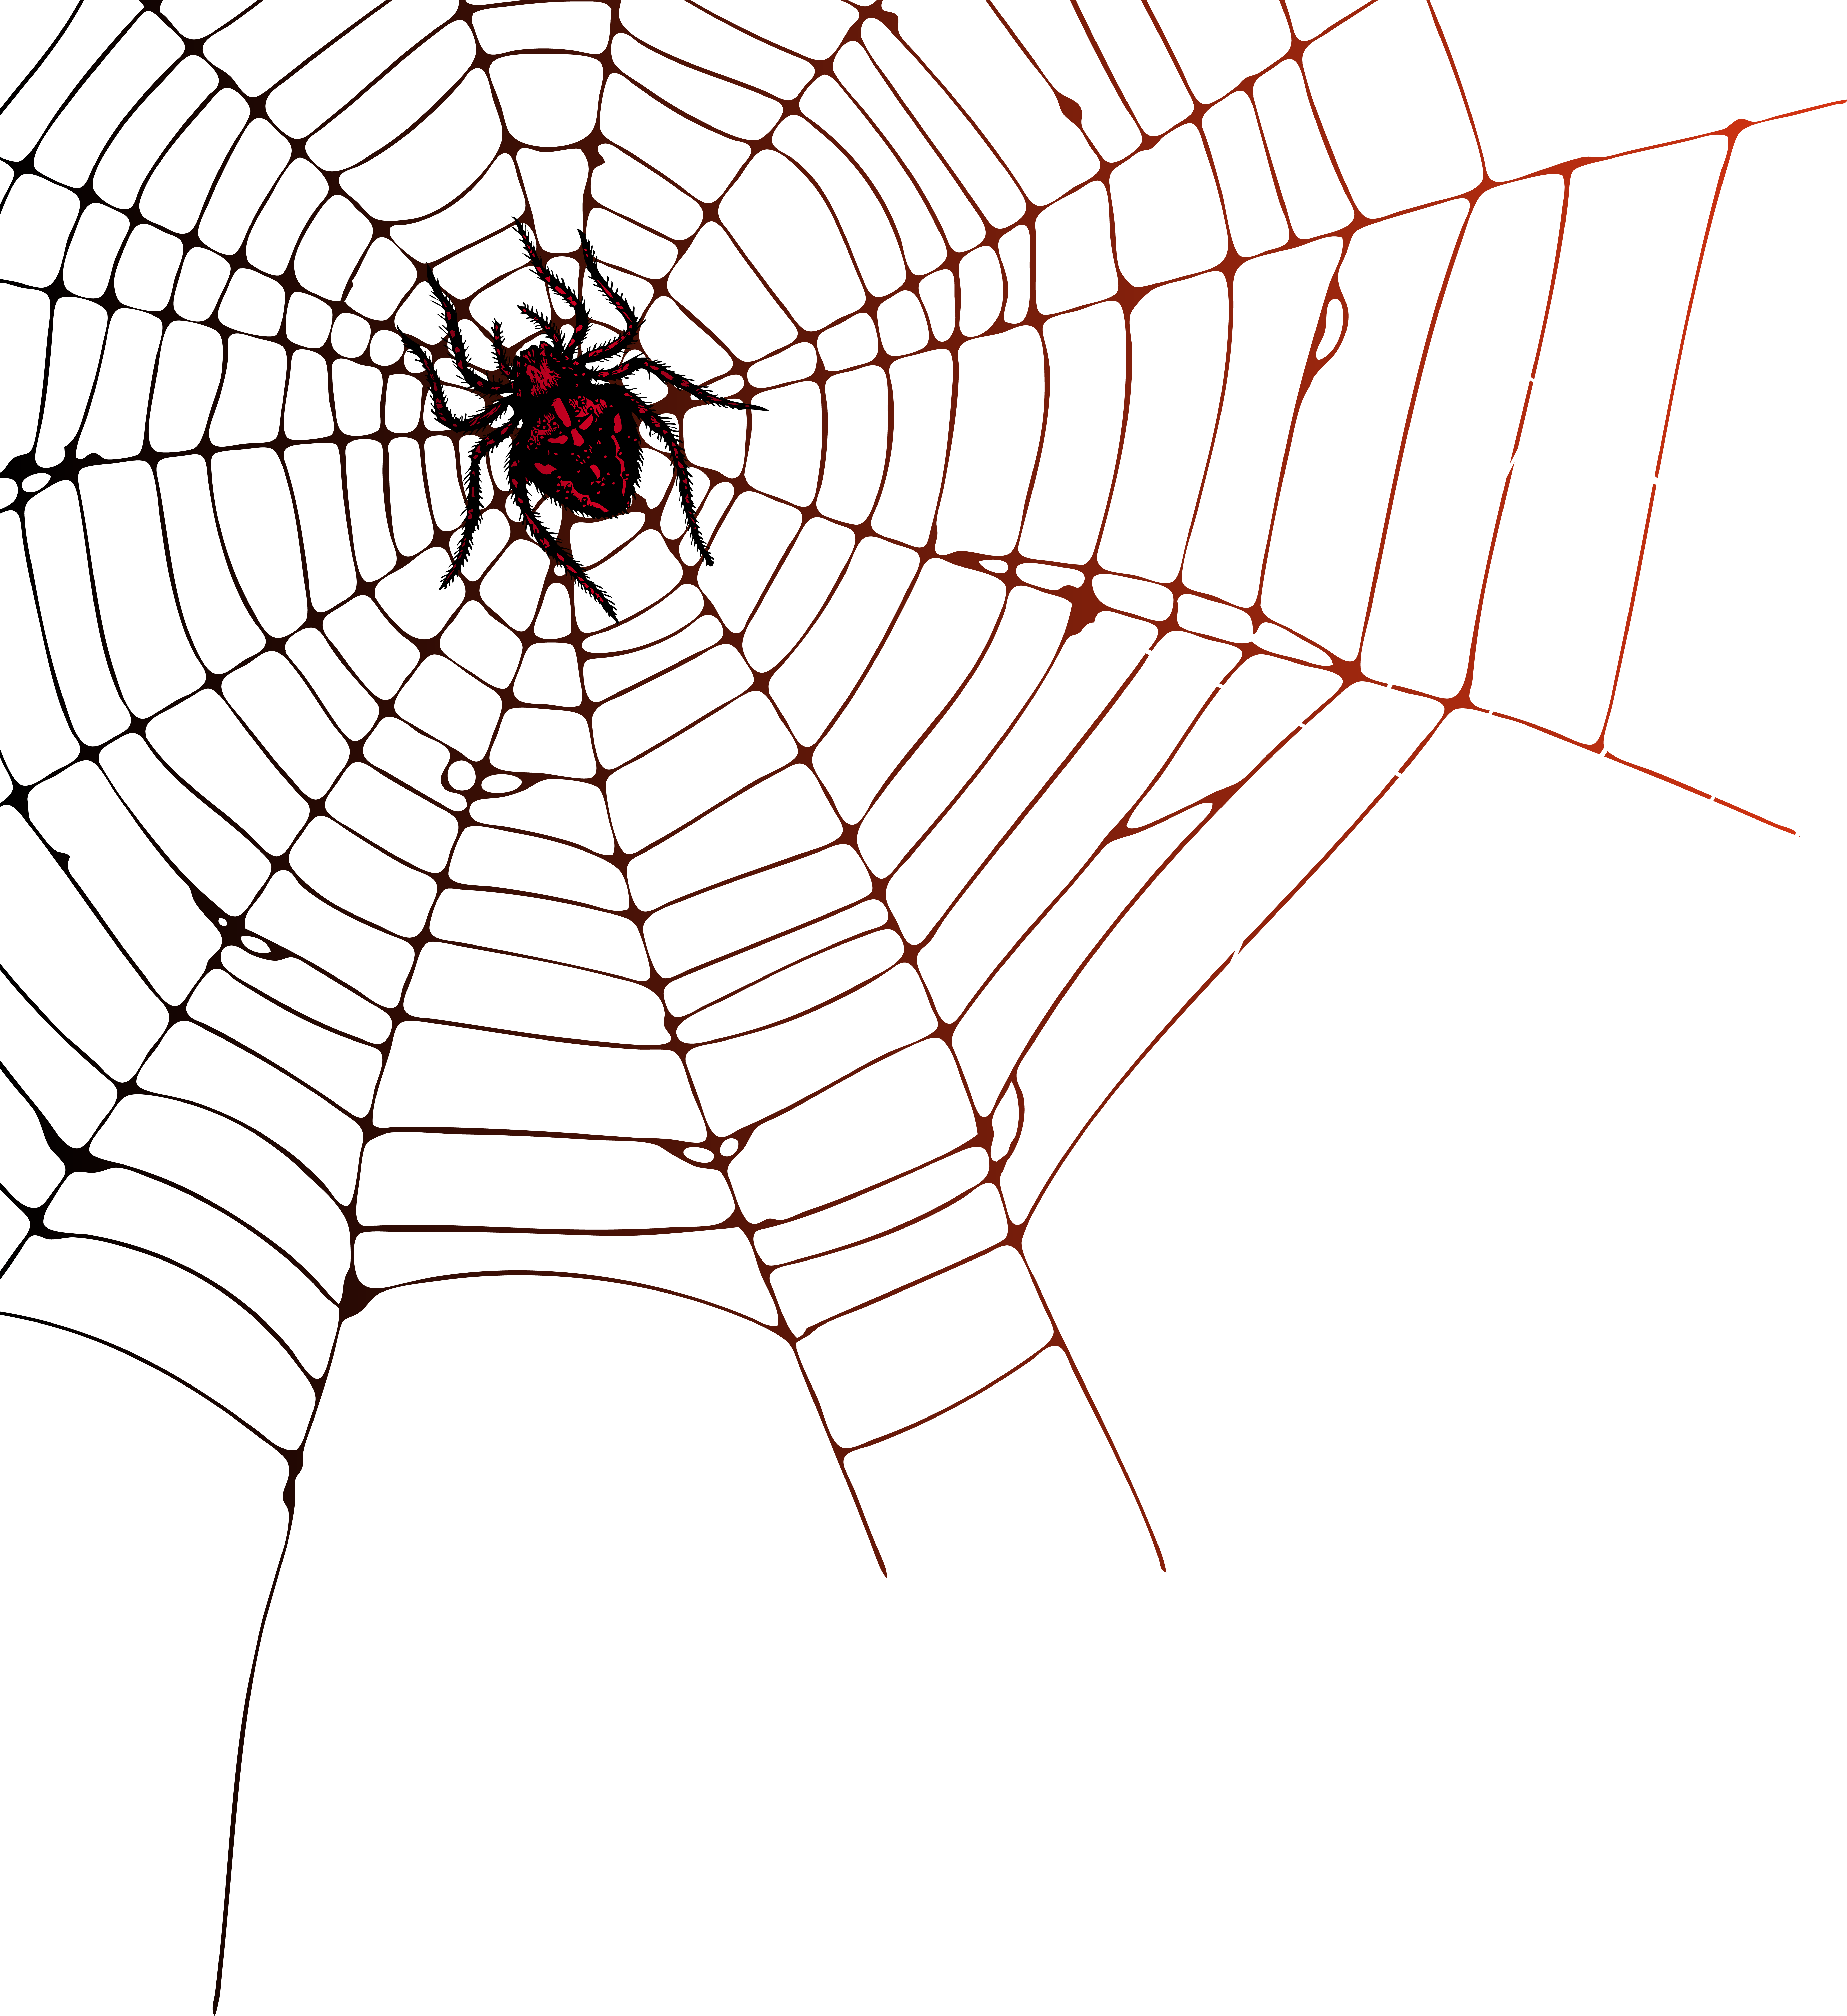 clip art transparent library Clipart web. Spider png clip art